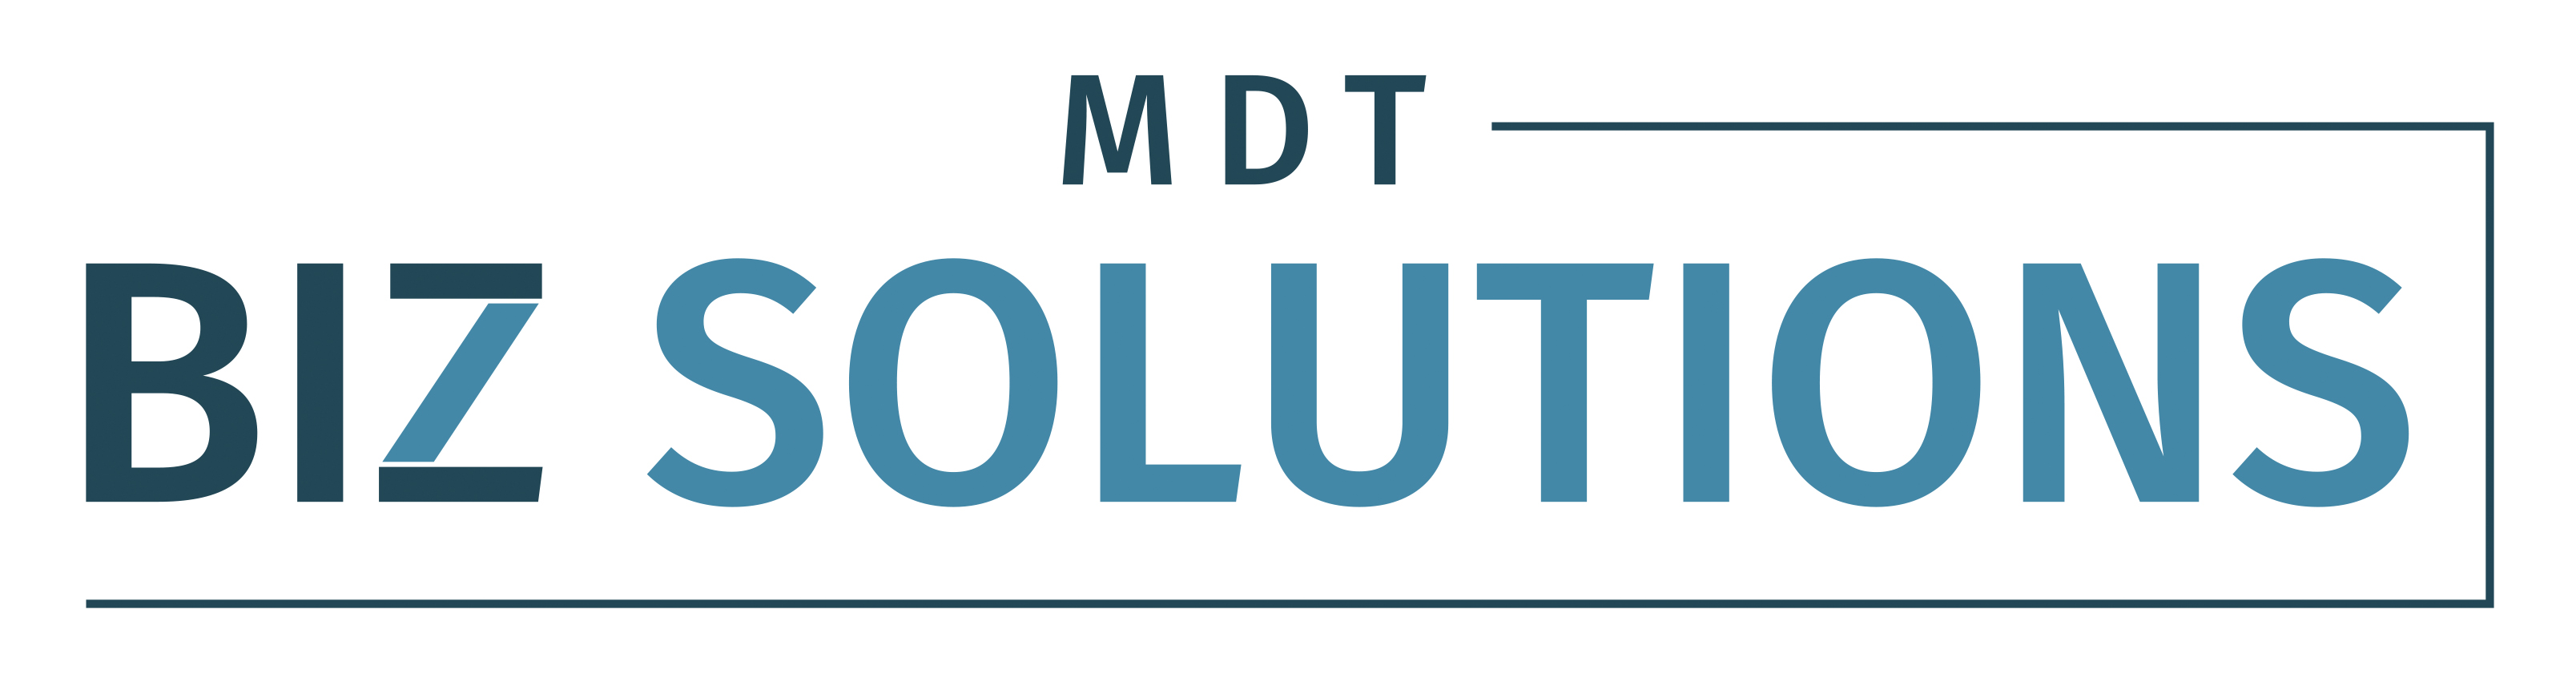 MDT Biz Solutions Ltd